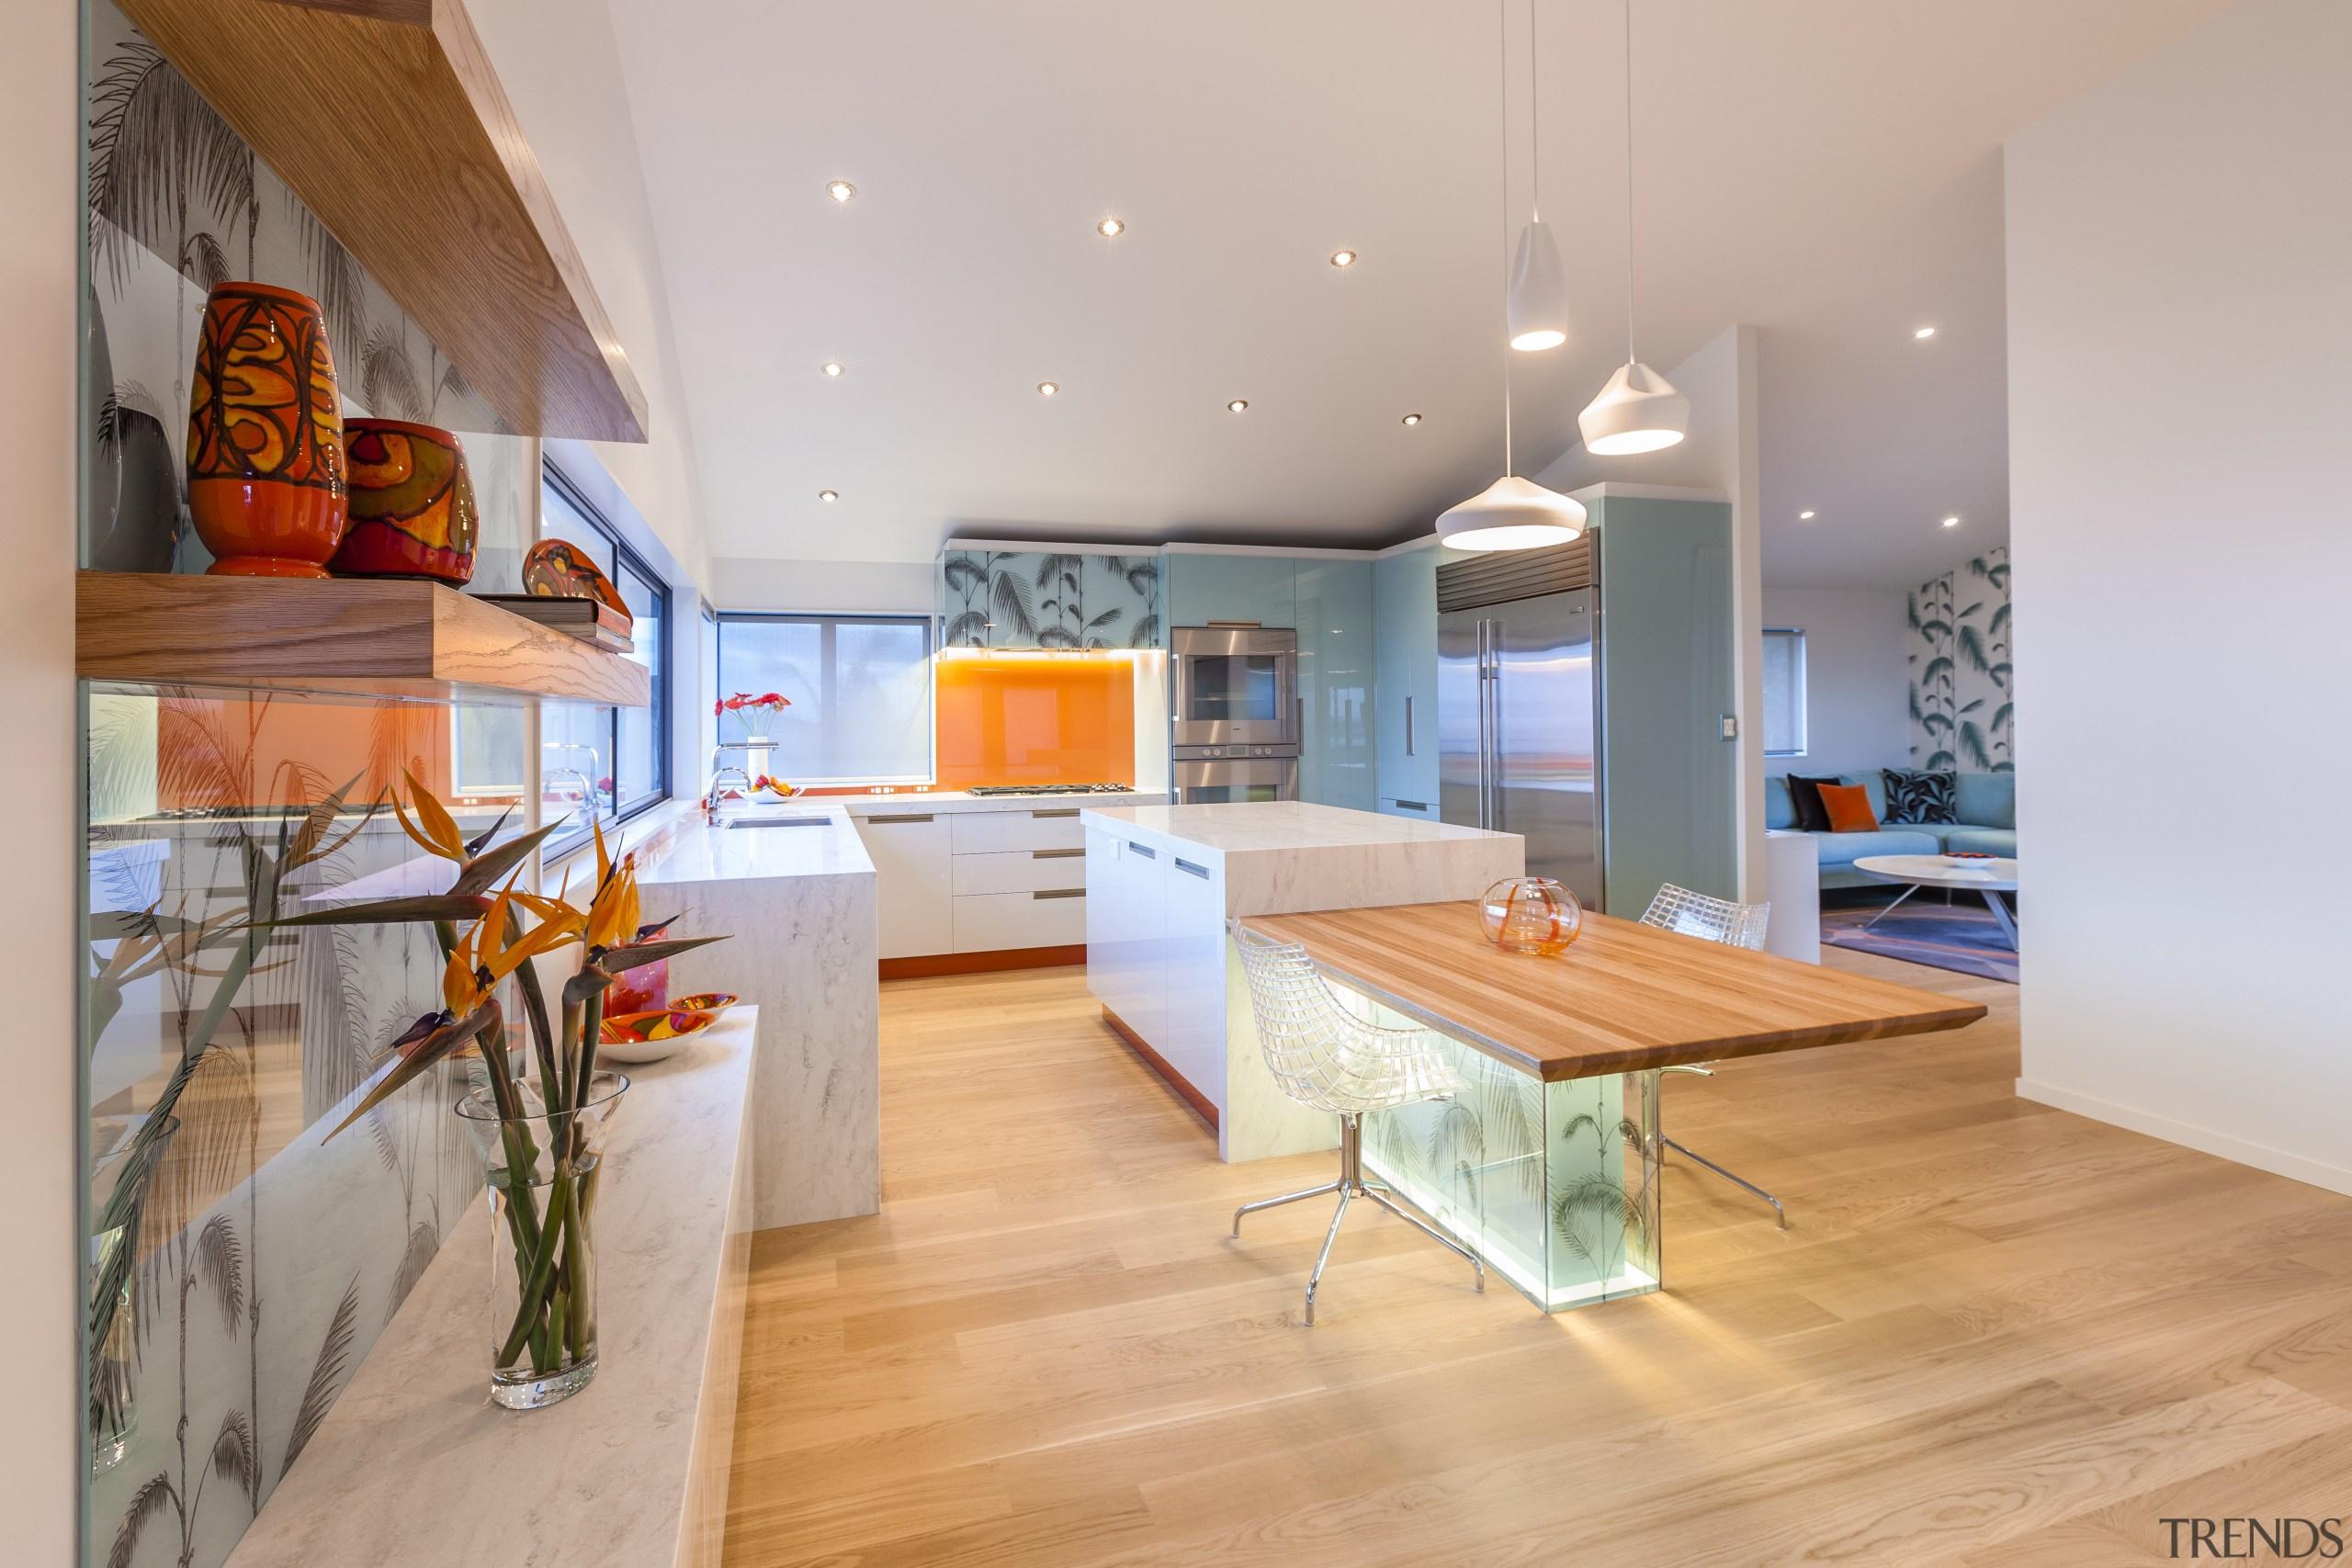 This kitchen was designed and built by Mal architecture, ceiling, floor, hardwood, interior design, interior designer, living room, loft, real estate, room, wood, wood flooring, gray, orange